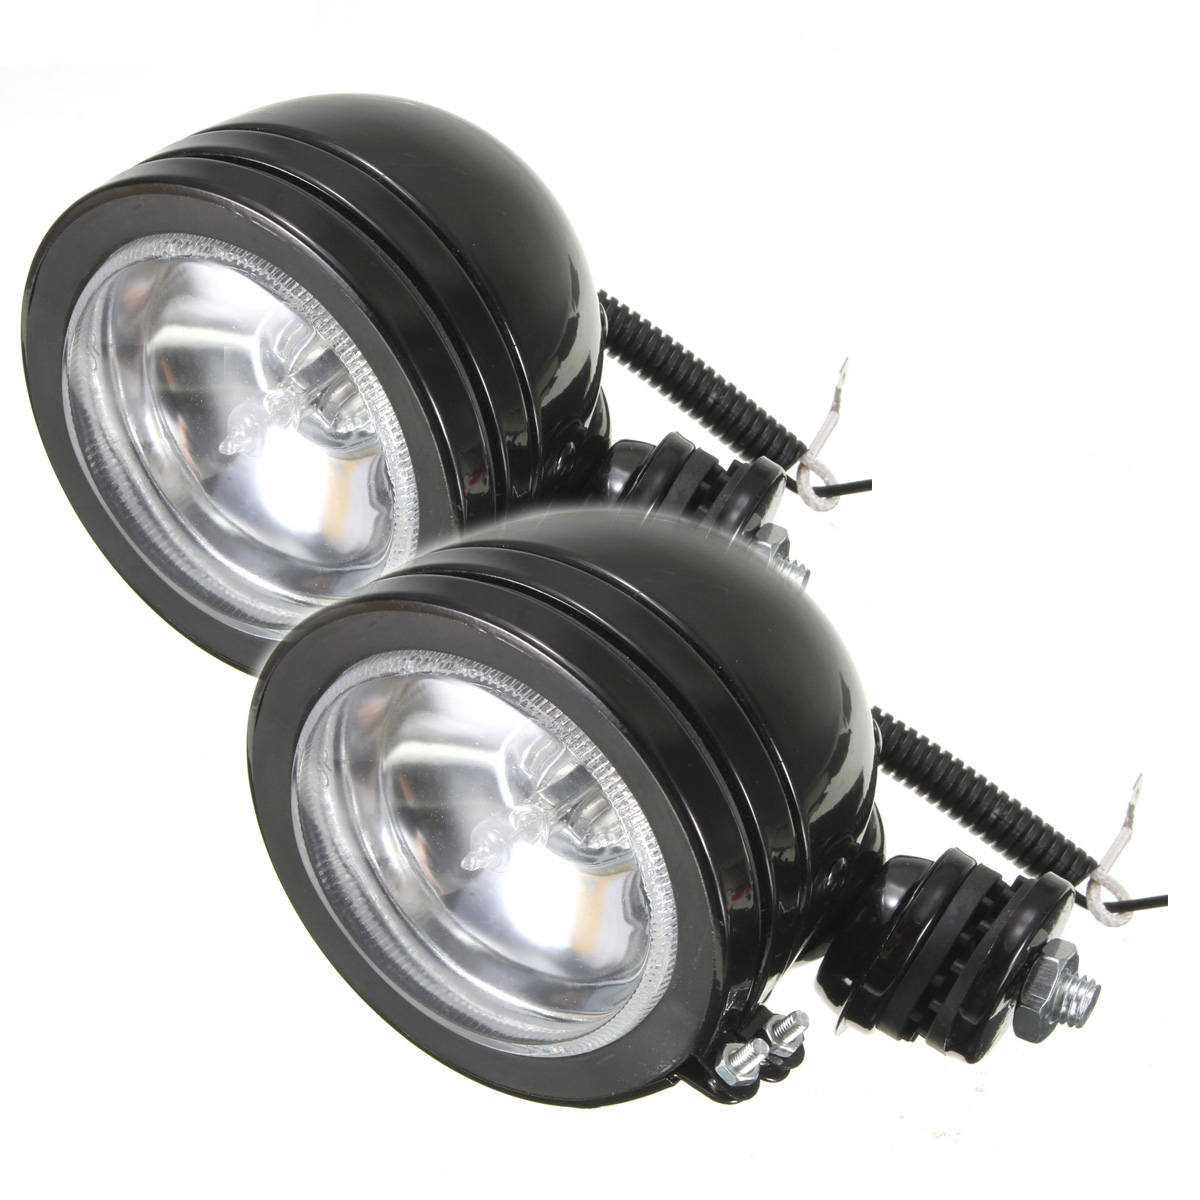 paire universel 4 led h3 12v 55w projecteur phare longue. Black Bedroom Furniture Sets. Home Design Ideas